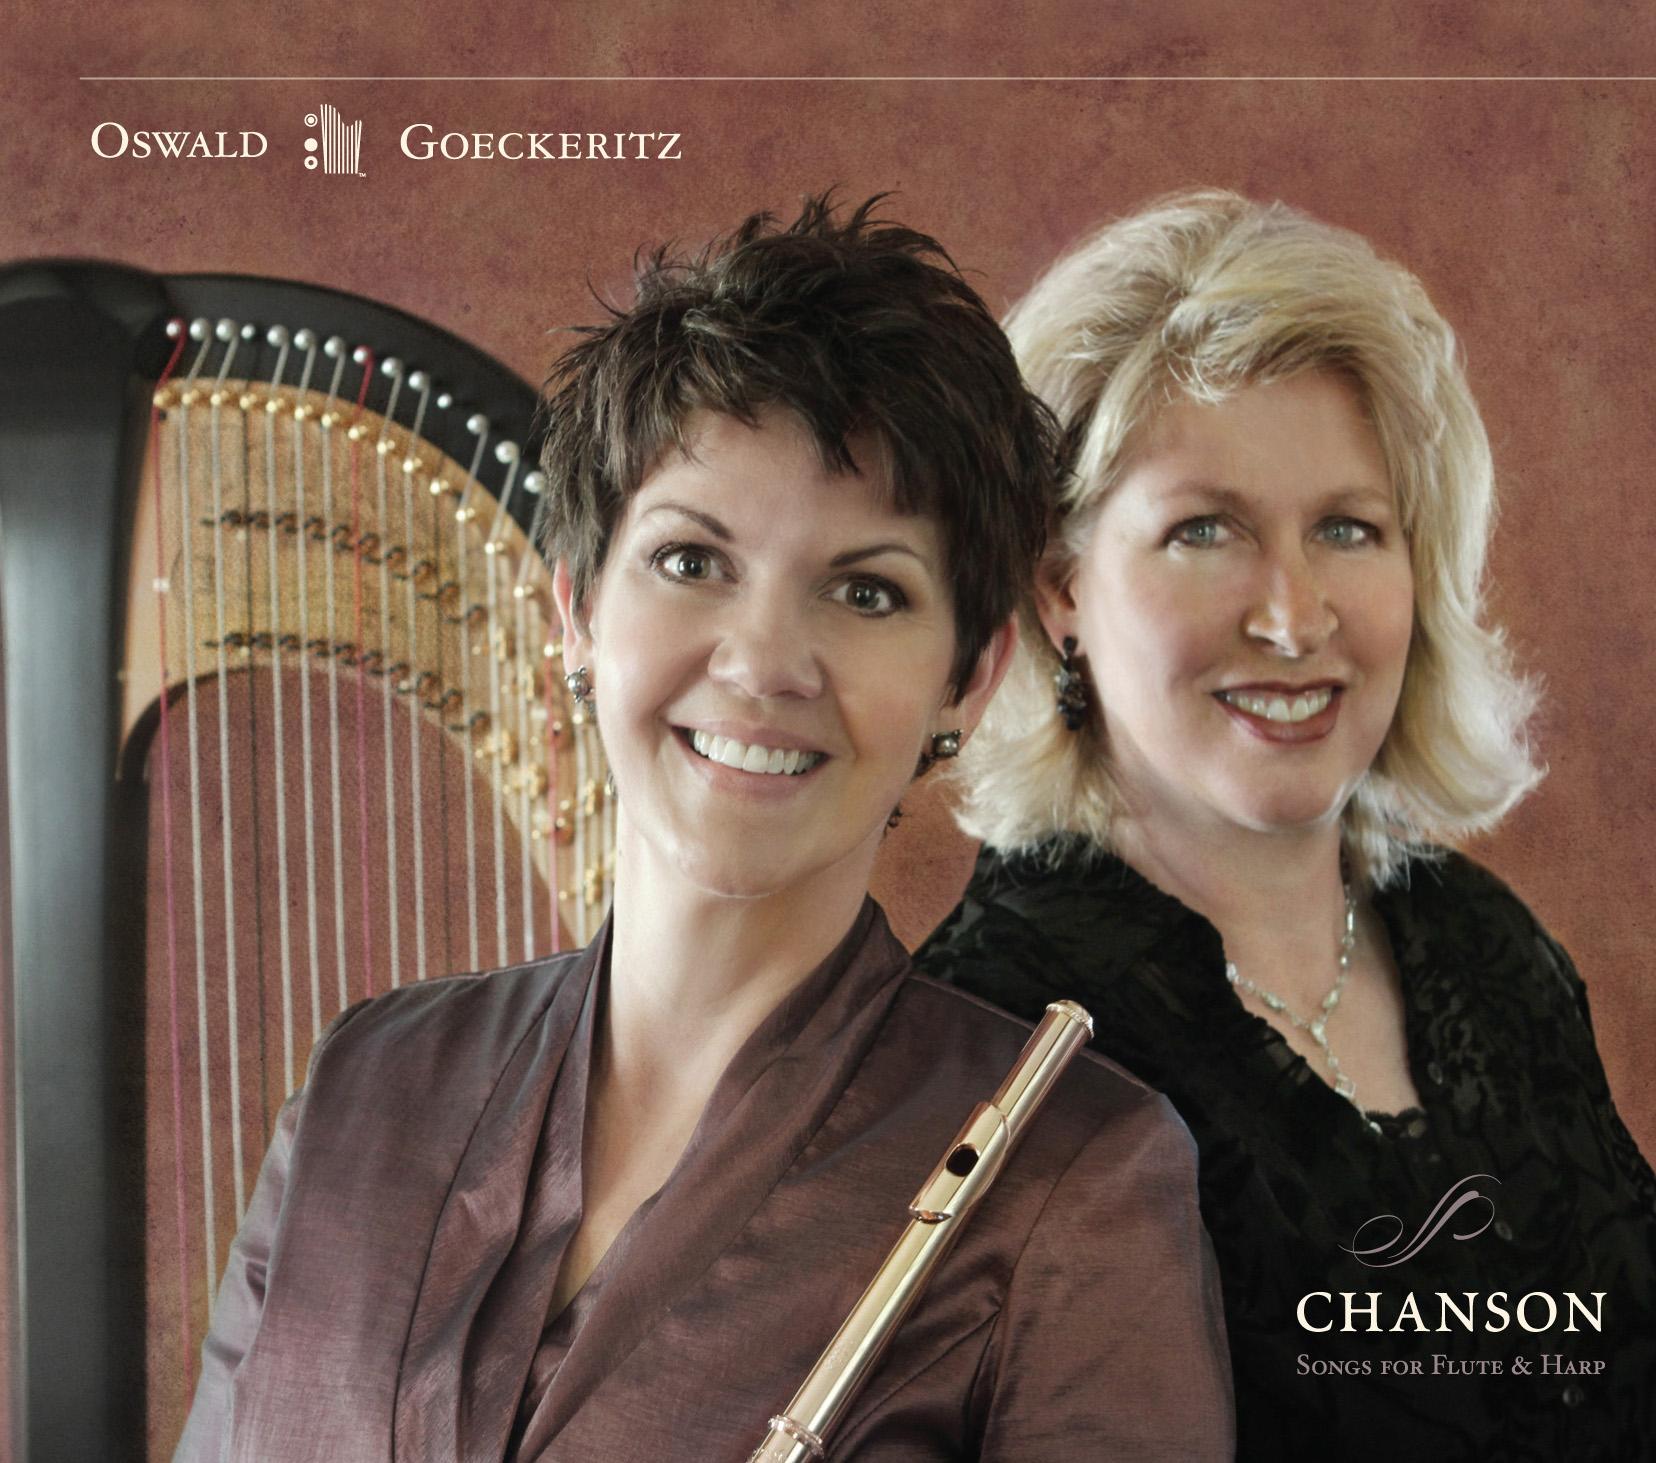 Chanson Album CD - Jeannine Goeckeritz - Tamara Oswald.jpg